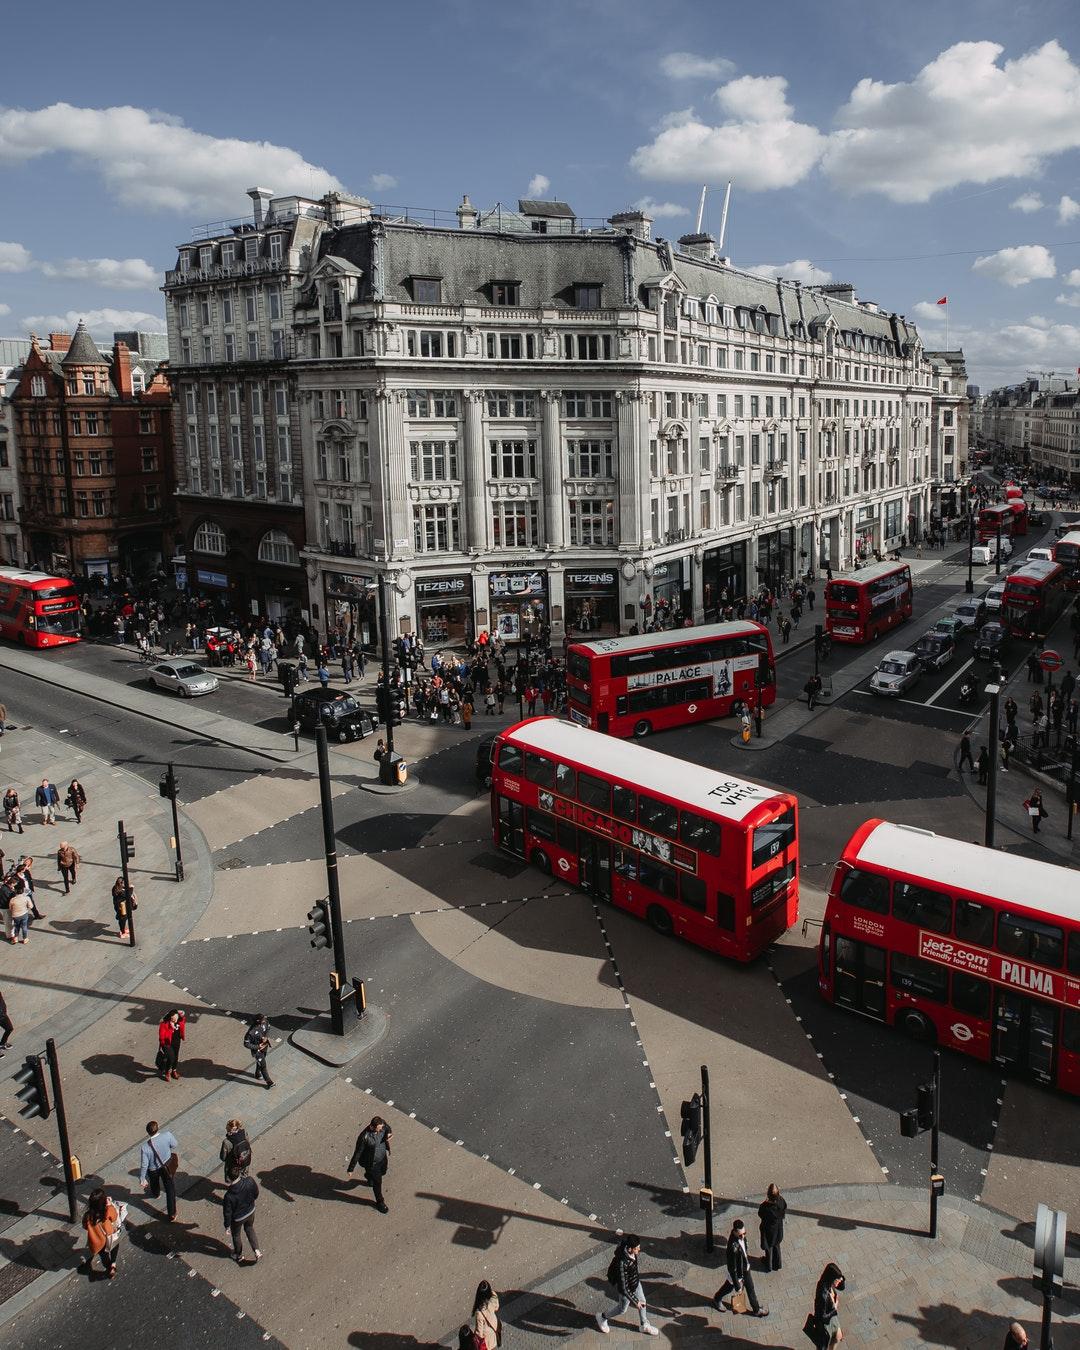 people walking on street near red double-deck buses